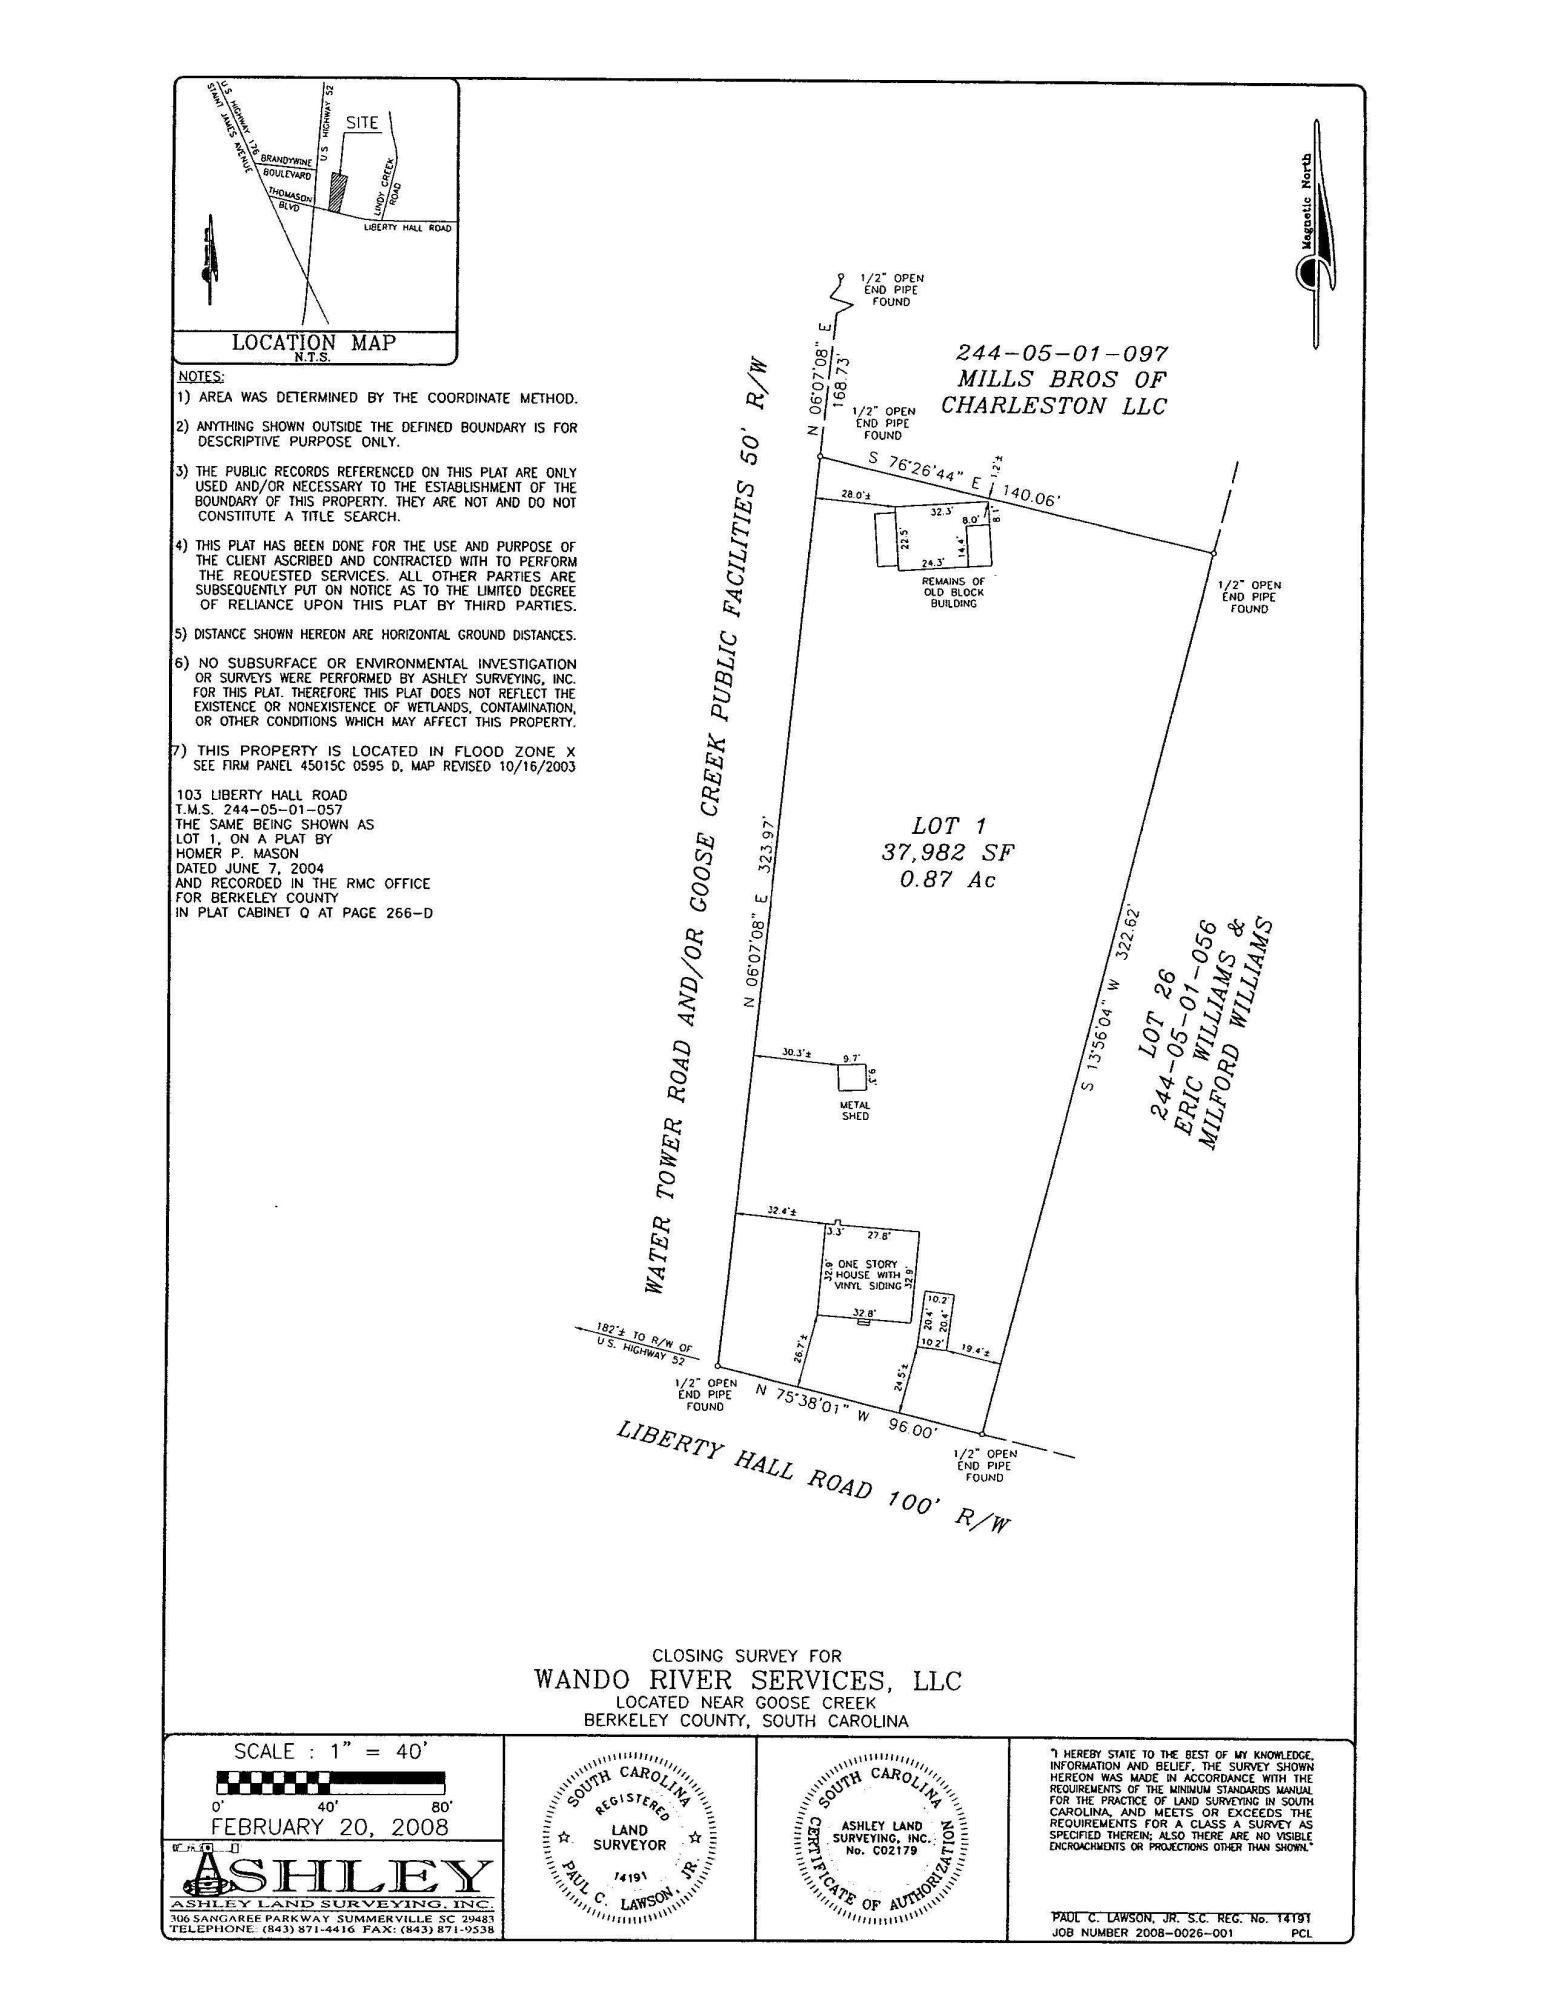 103 Liberty Hall Road Goose Creek, SC 29445